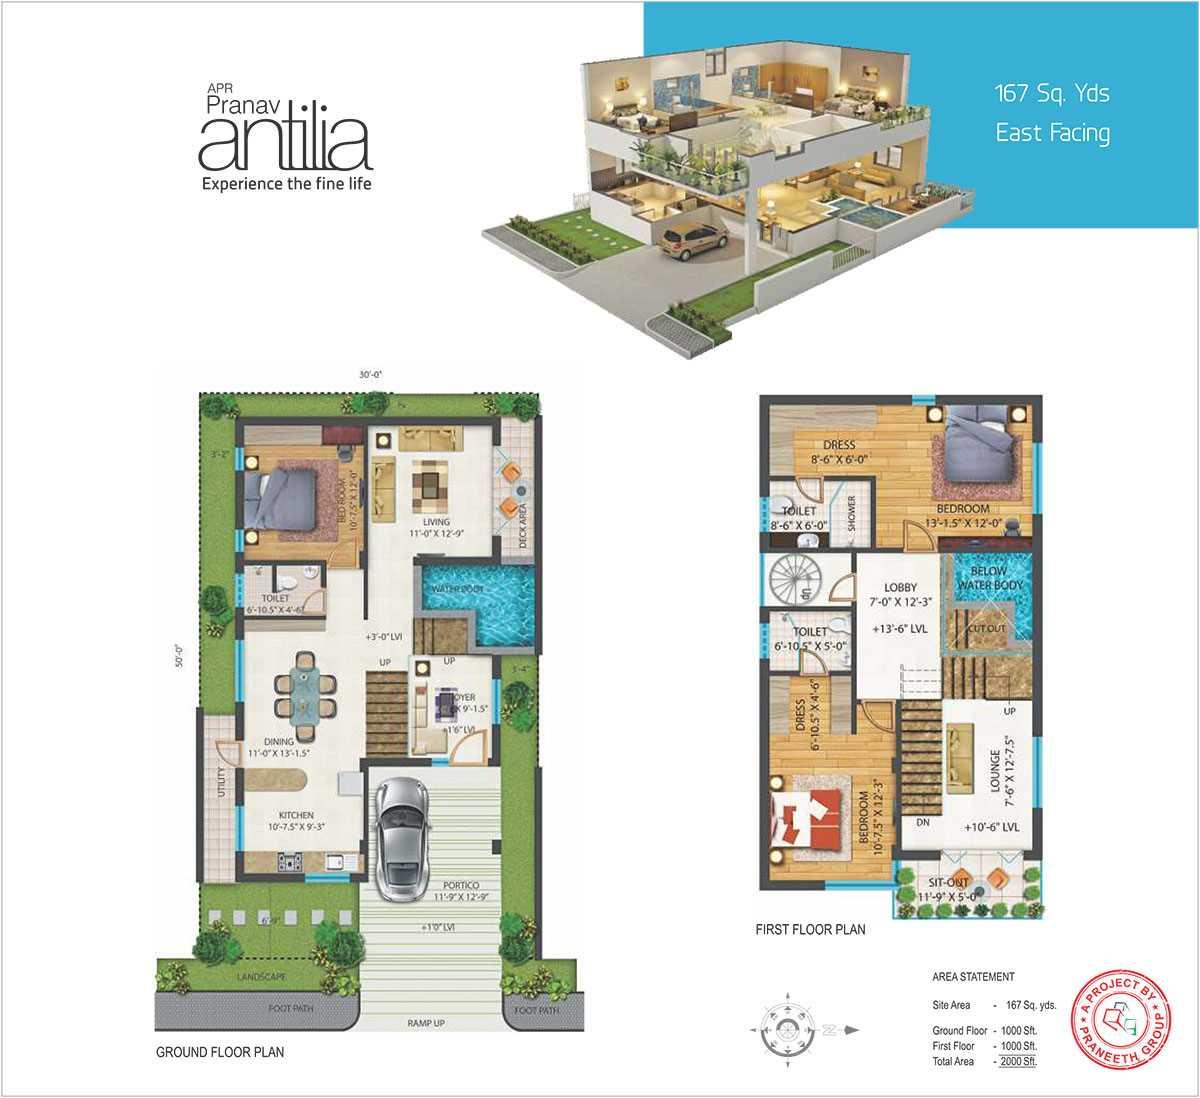 Bedroom Designs From Professionals In Hyderabad  C2NyYXBlLTEtRHBWSGVH: Real Estate Concierge Hyderabad